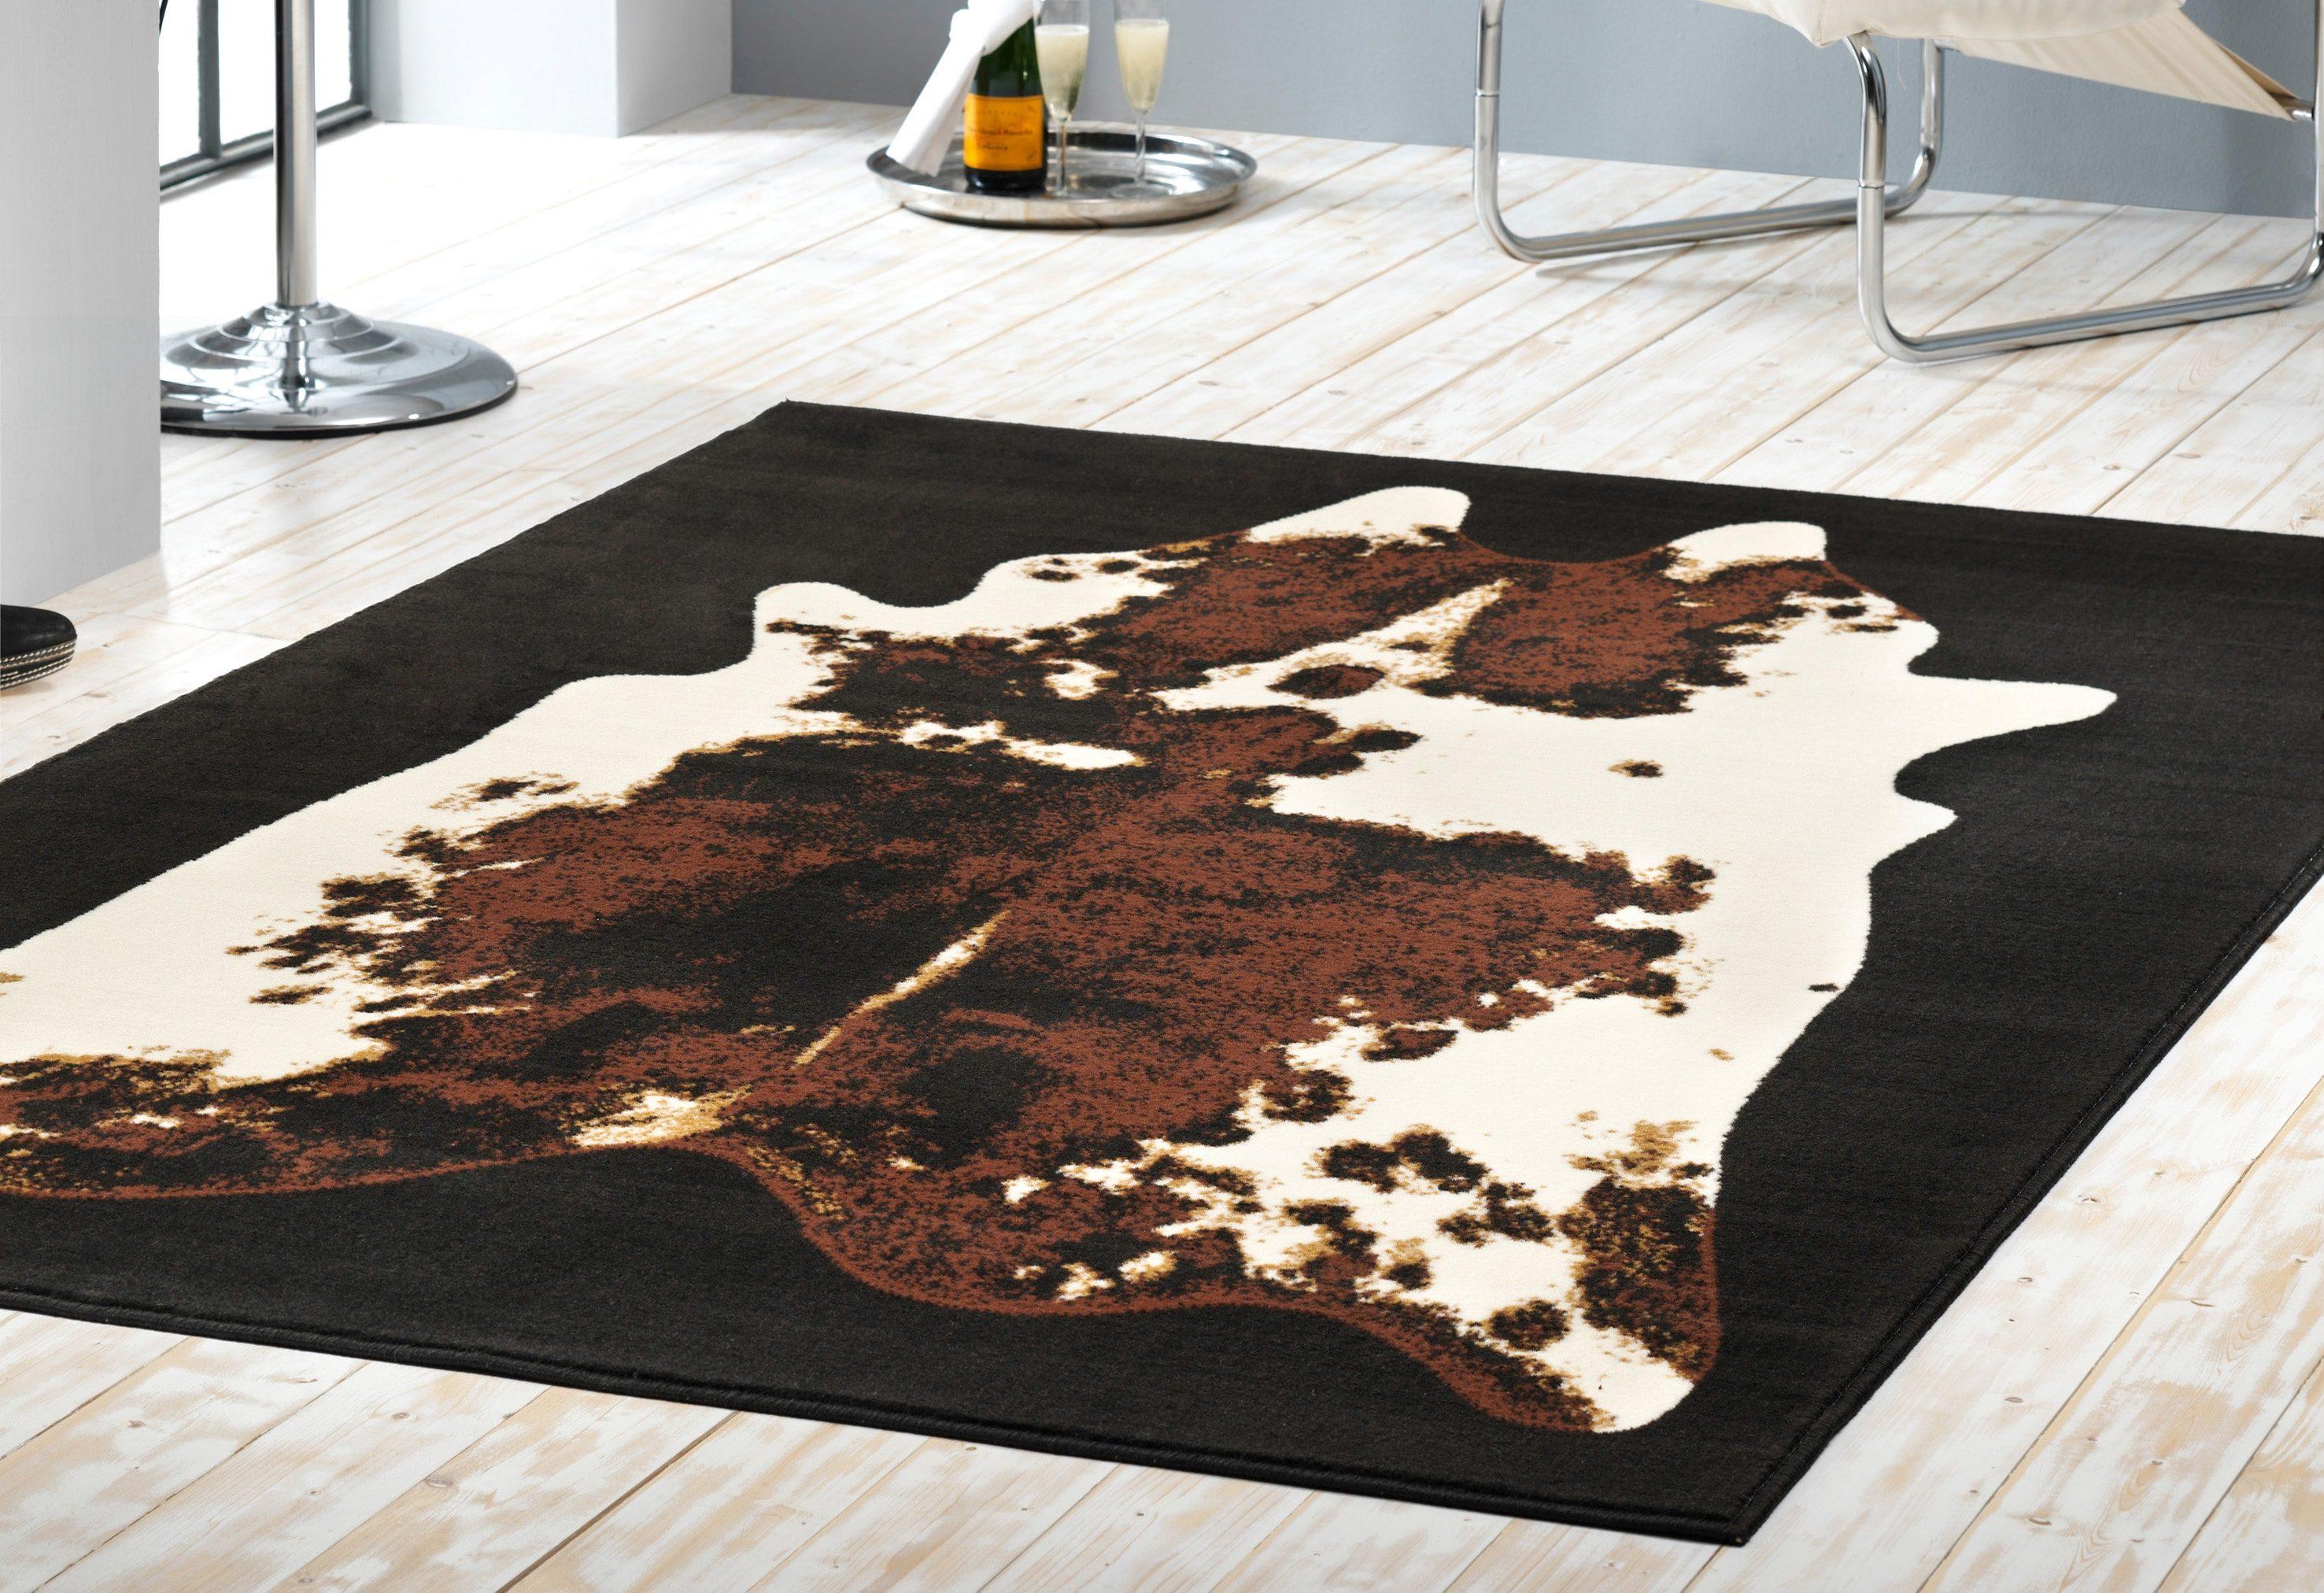 Hanse home vloerkleed koeienhuid vloerkleed moss nu online